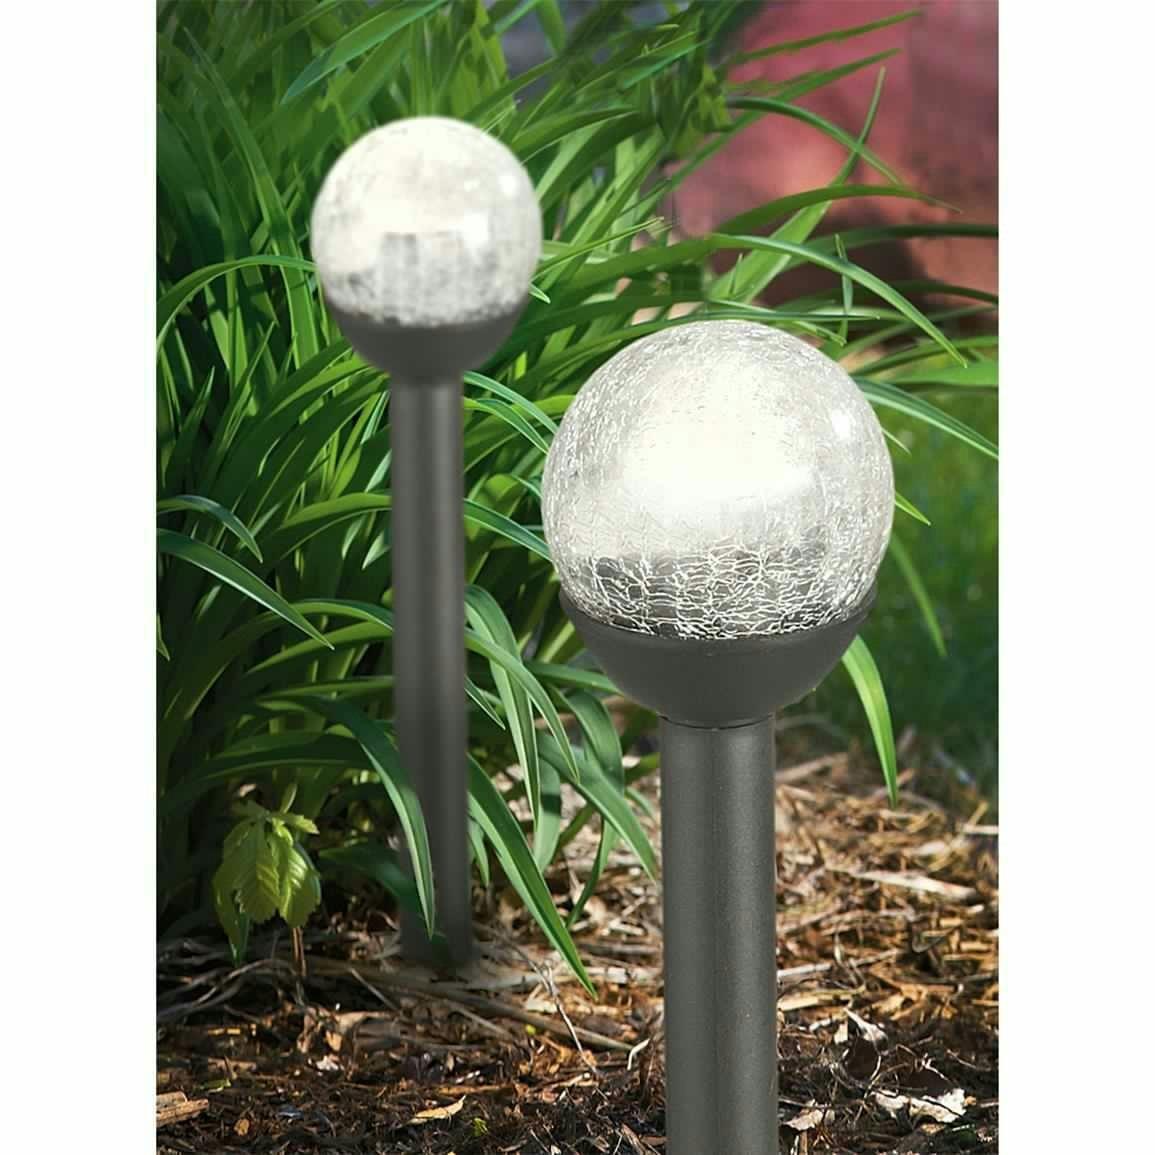 Lampara luz led panel solar para exteriores jardin hogar - Lamparas exteriores para jardin ...